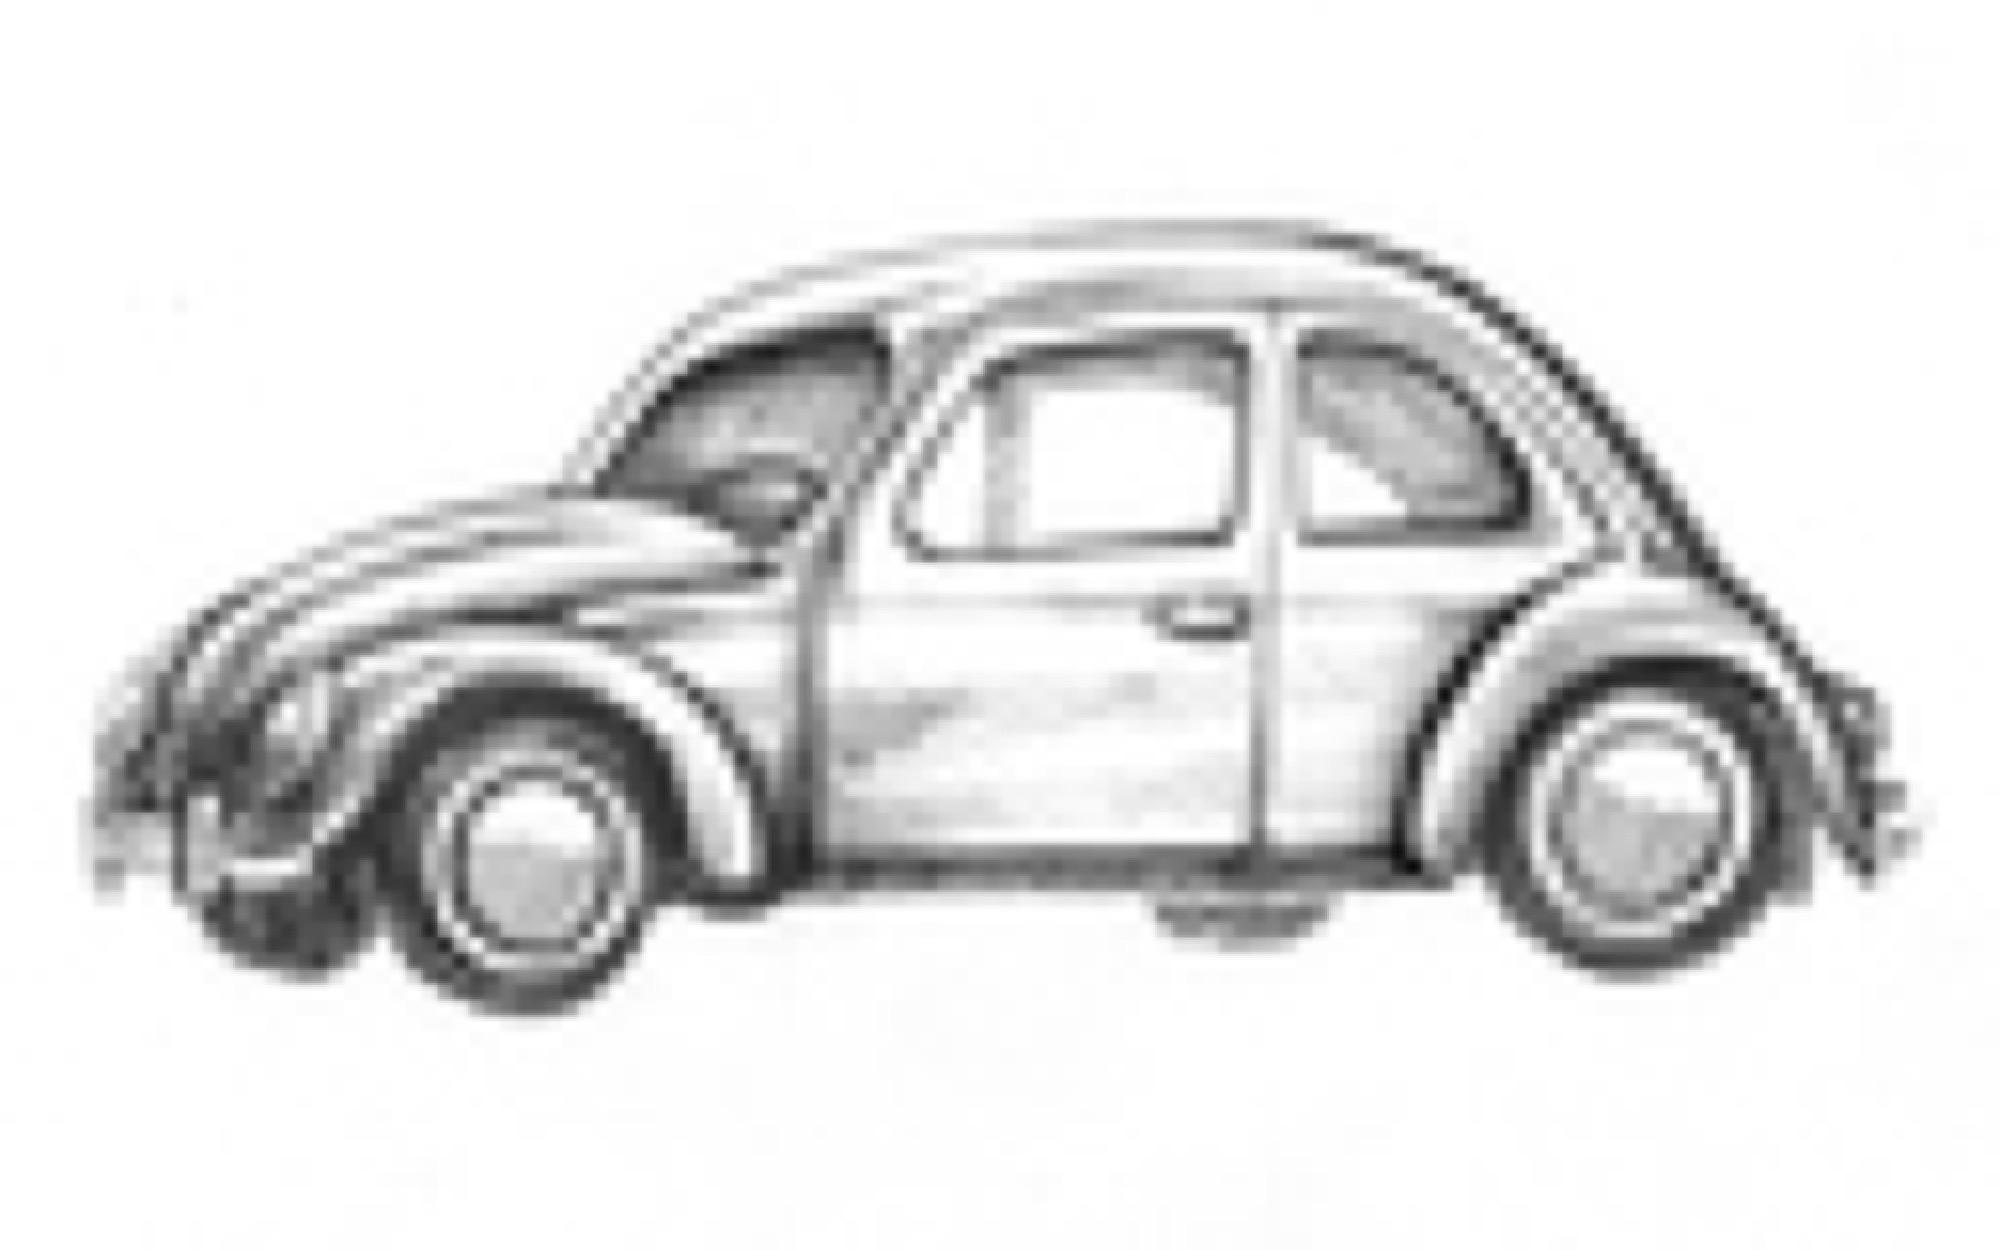 Dräger bil 2 sagamariah